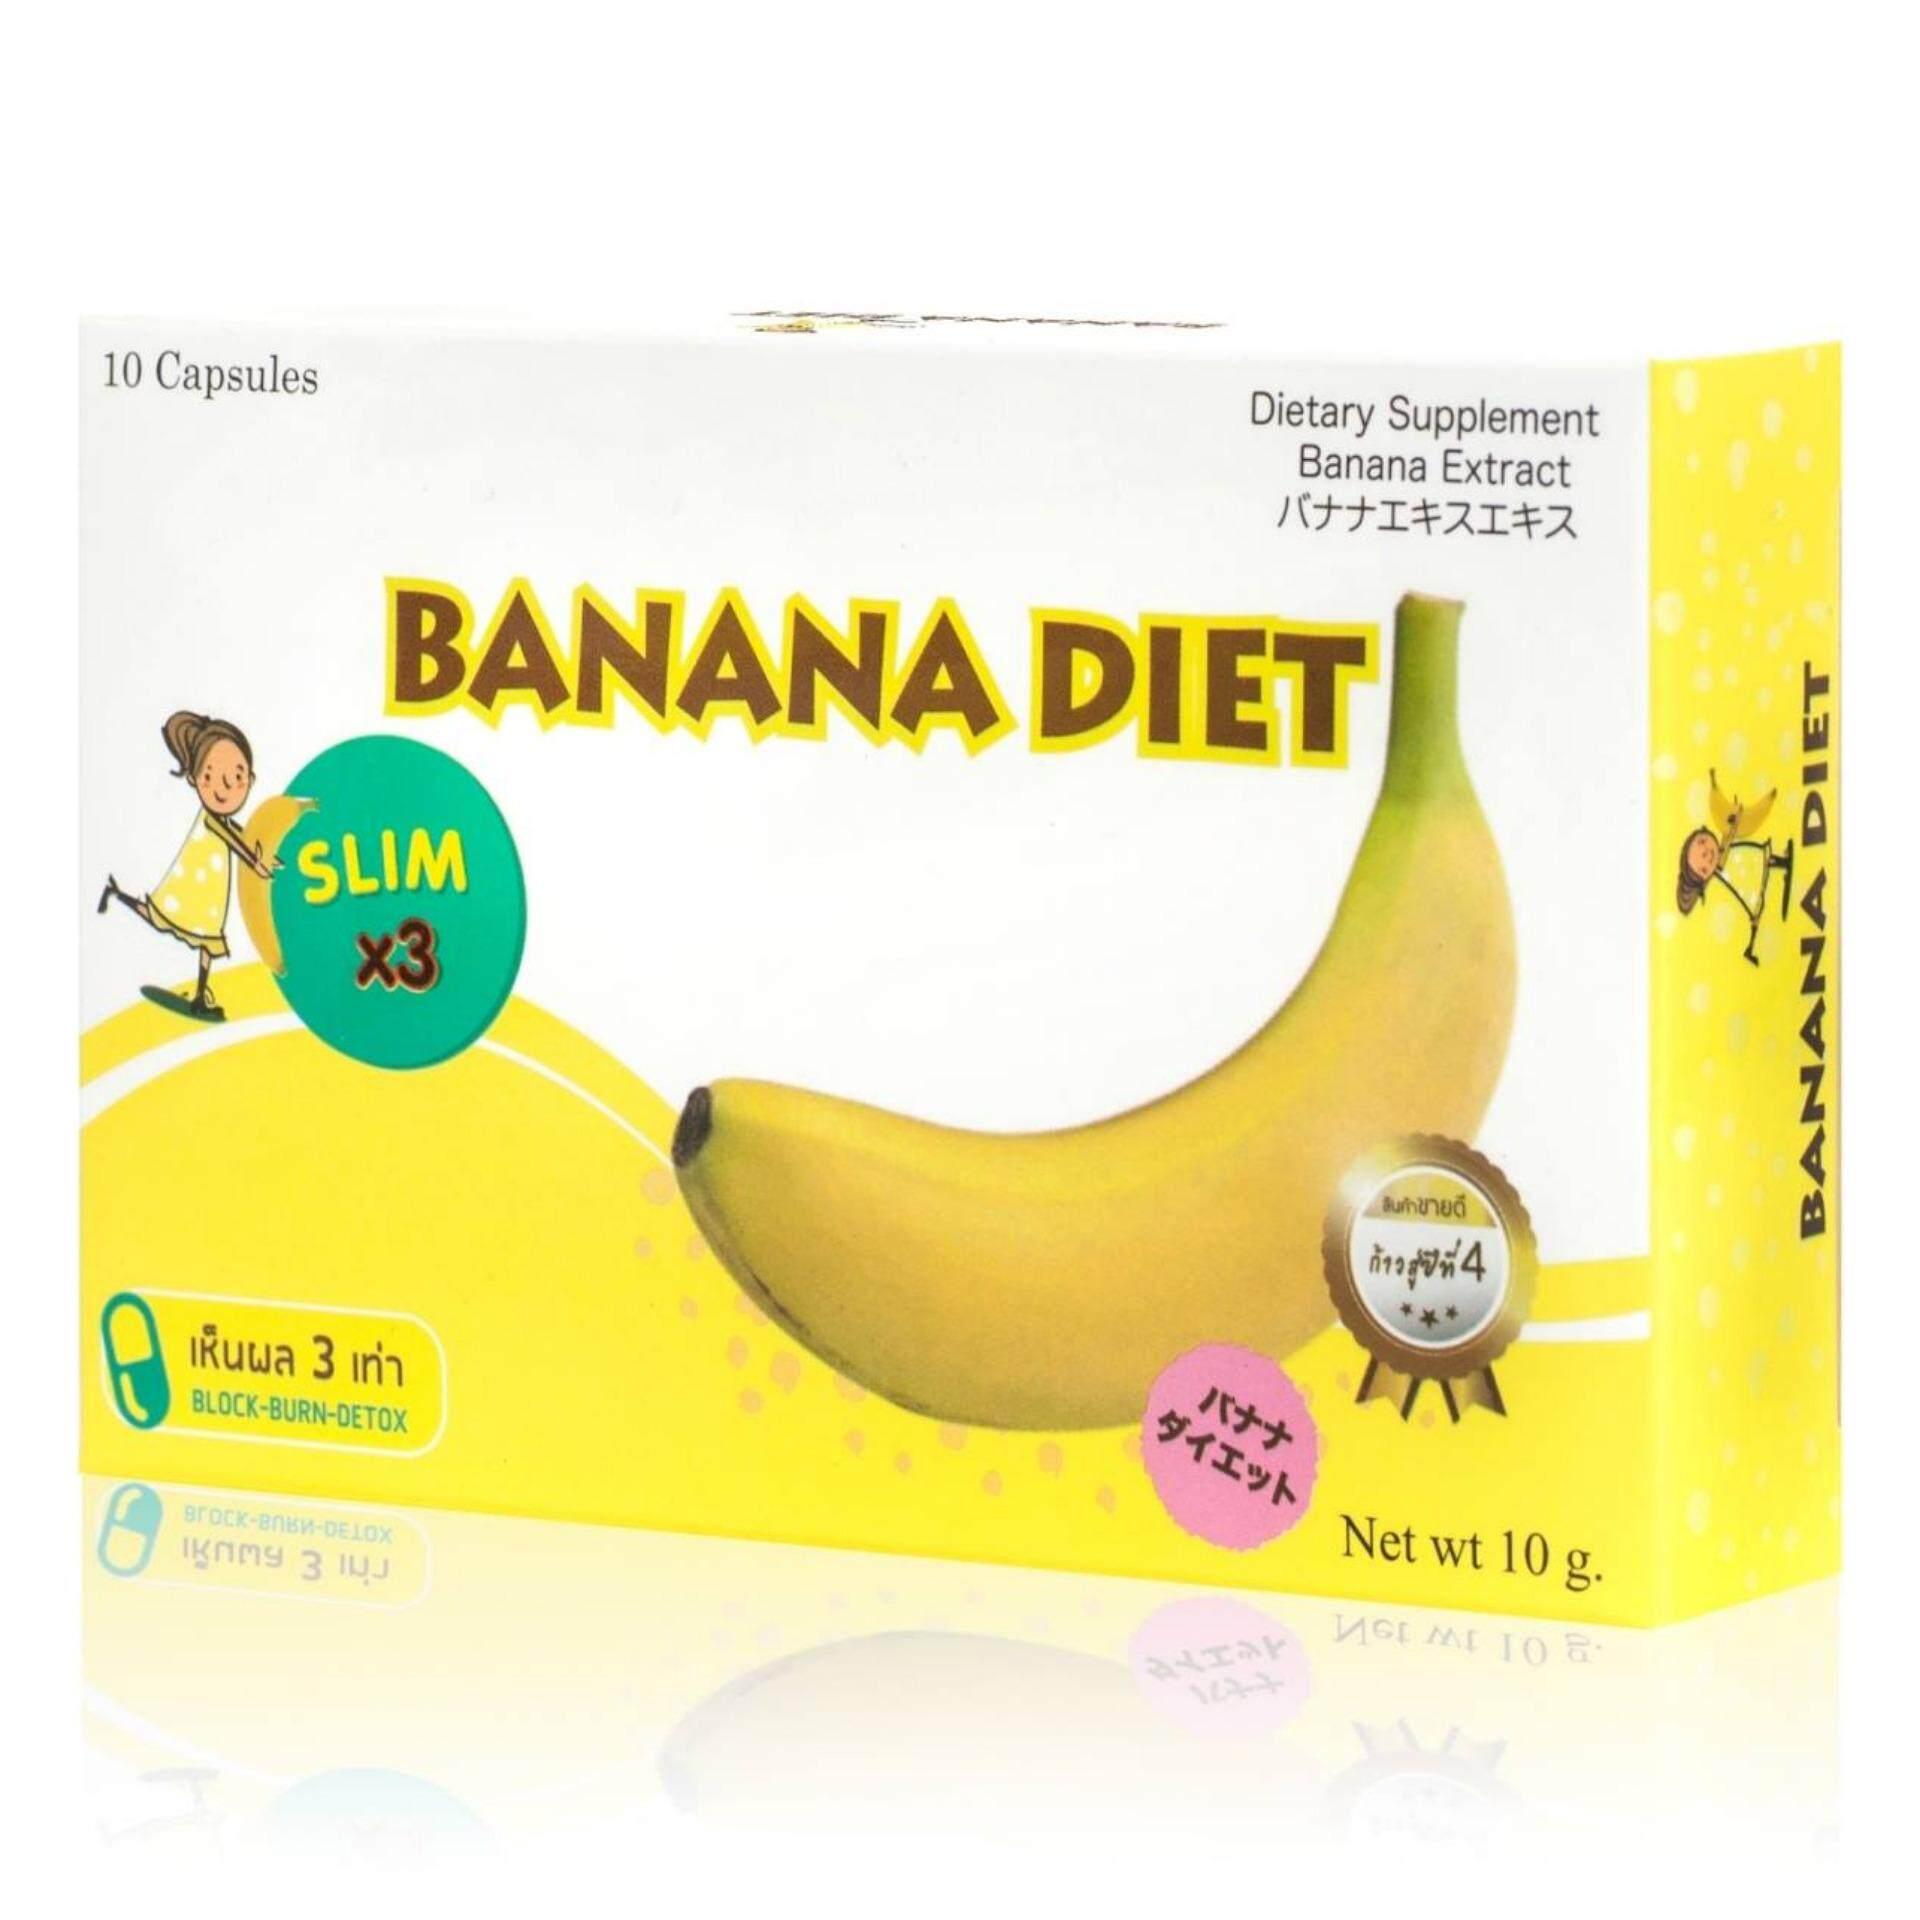 Banana Diet อาหารเสริมลดน้ำหนัก กล่อง 10 แคปซูล เป็นต้นฉบับ